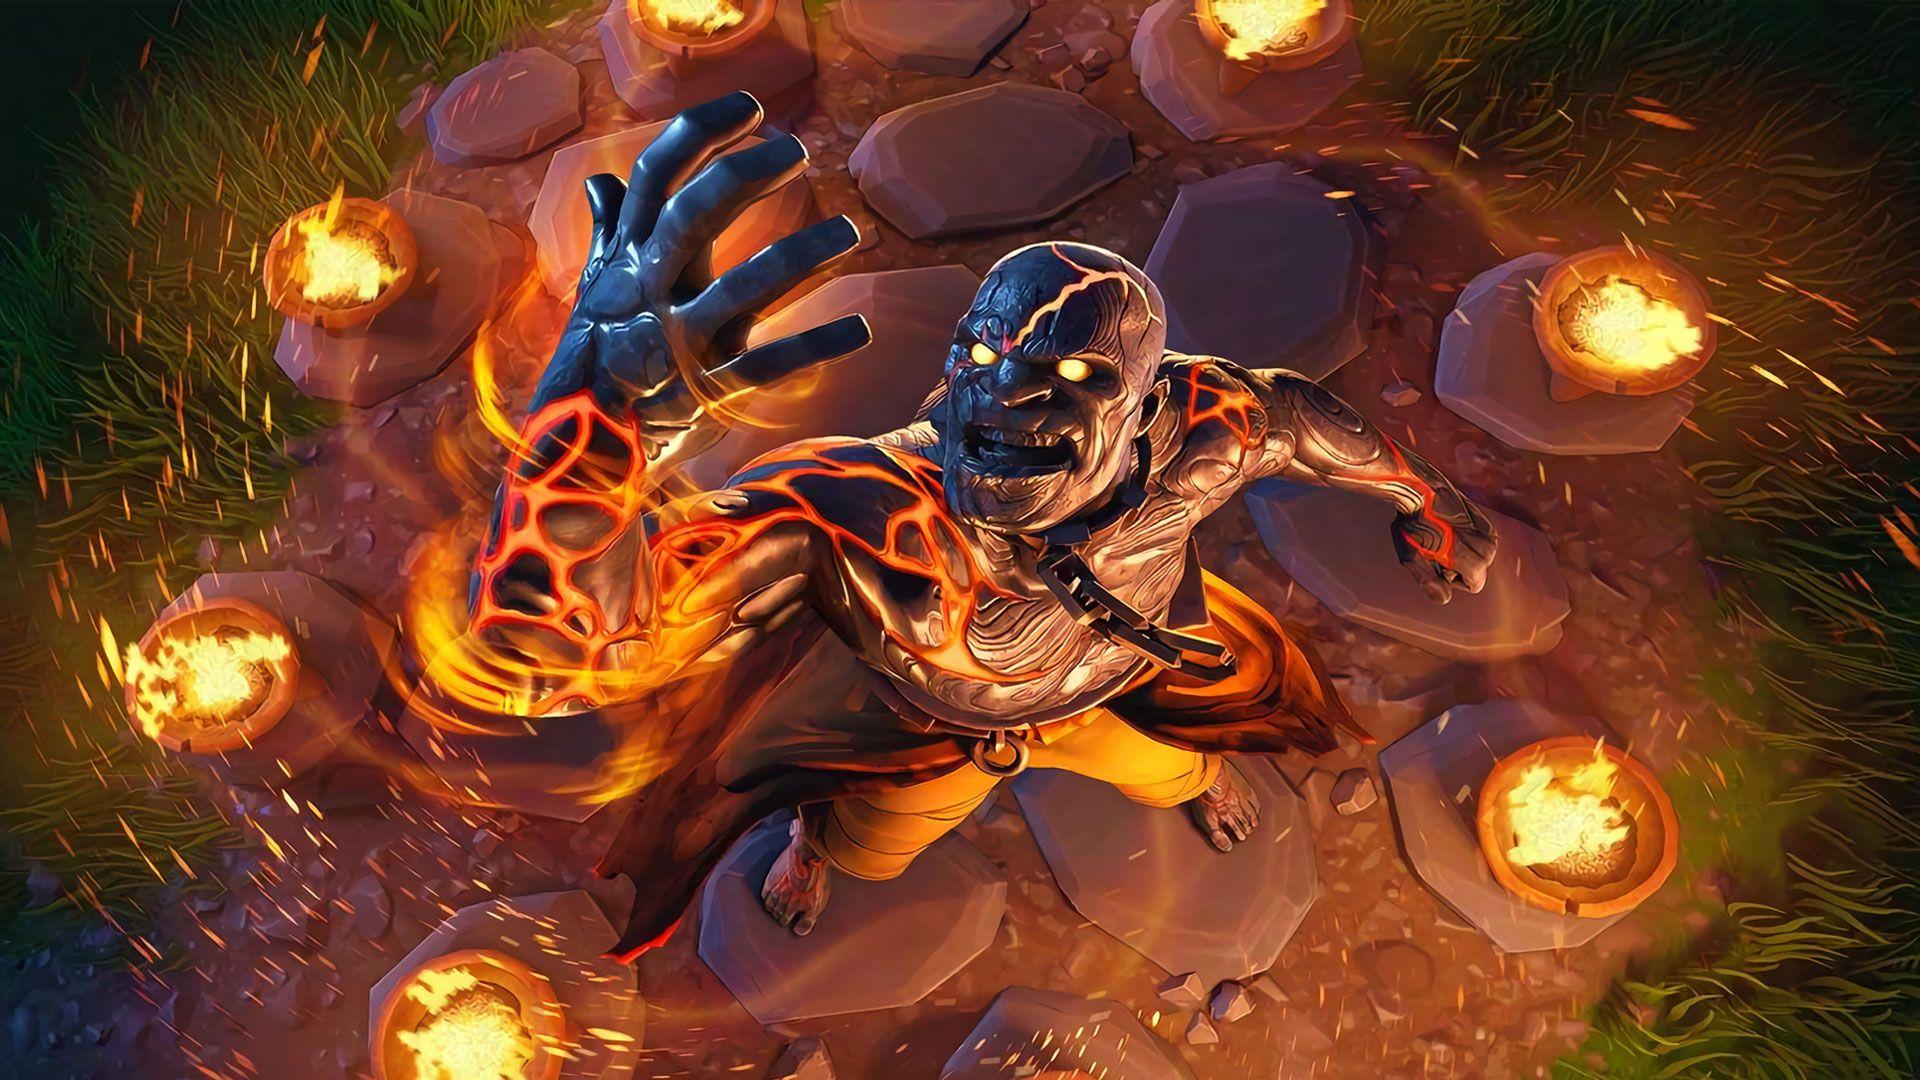 Video Game Fortnite Hd Fire Wallpaper Fortnite Season 8 Wallpaper